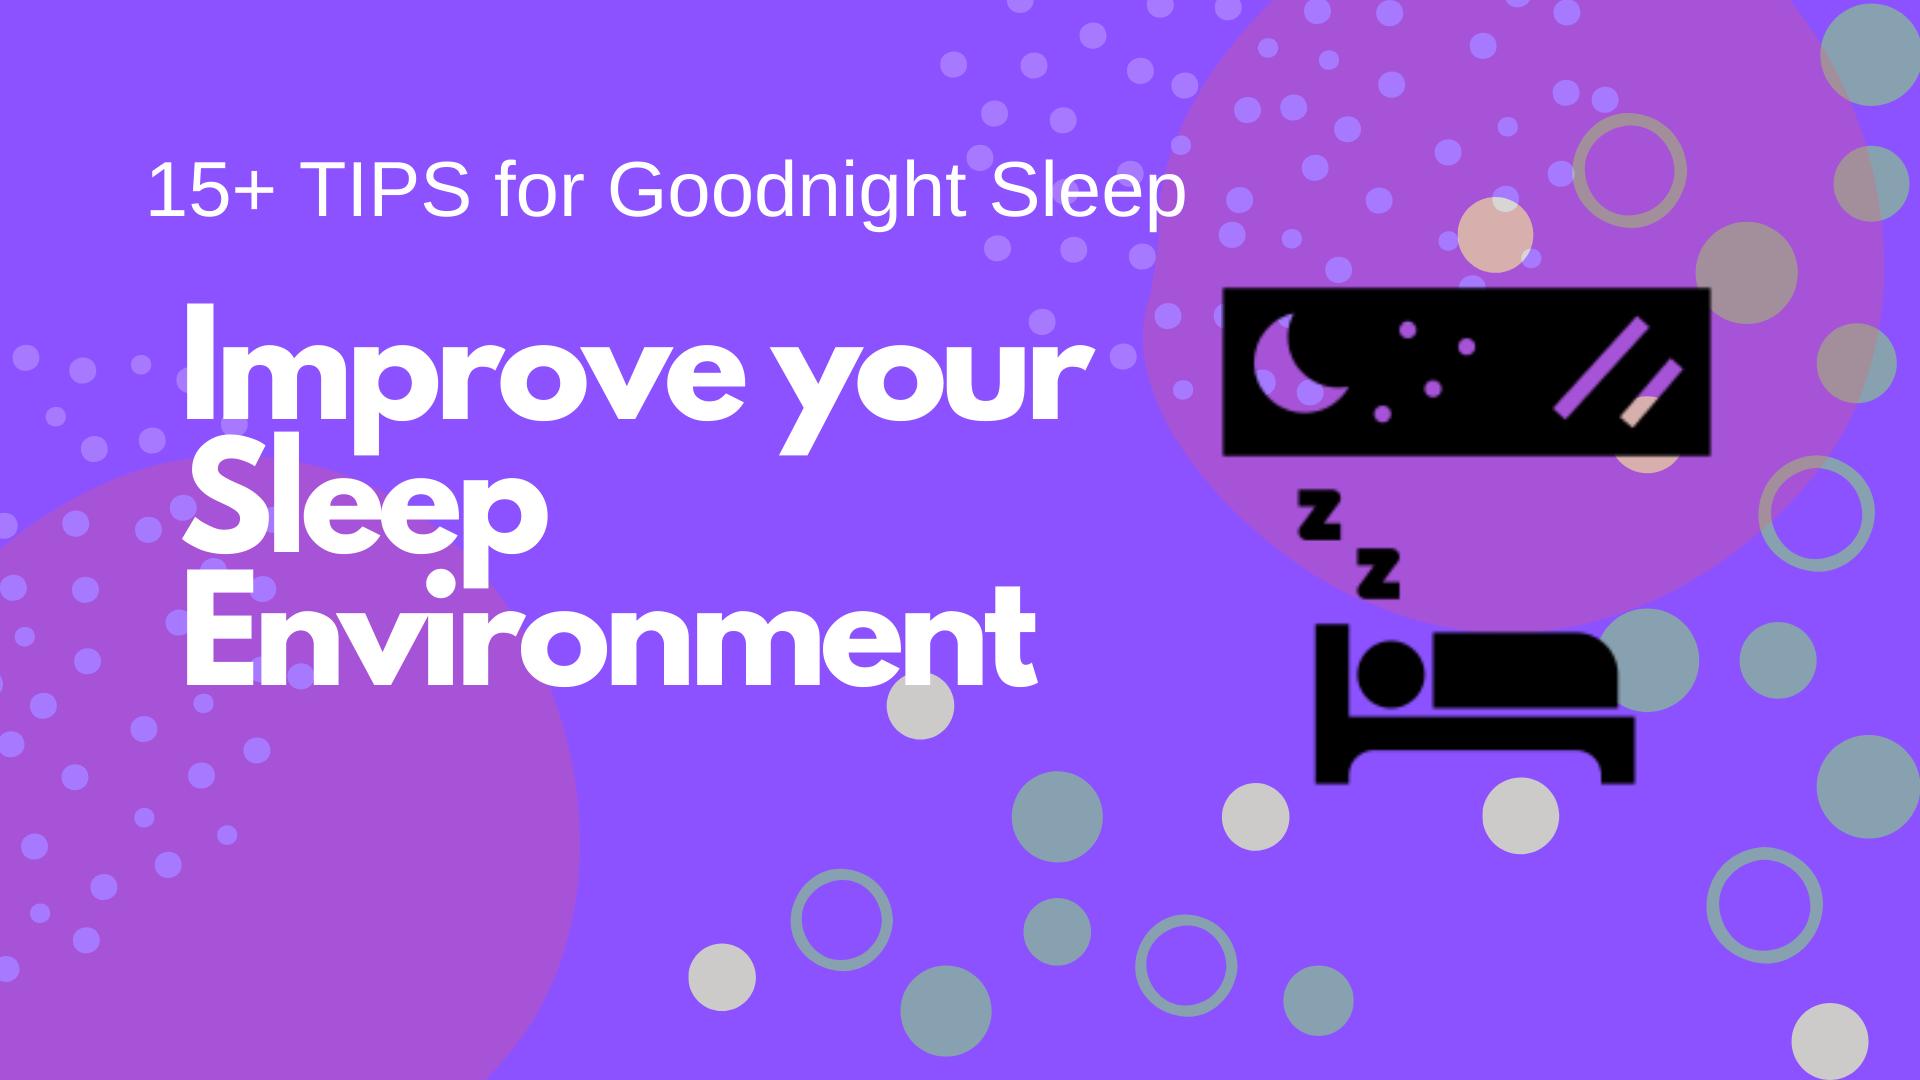 Improve your Sleeping Environment